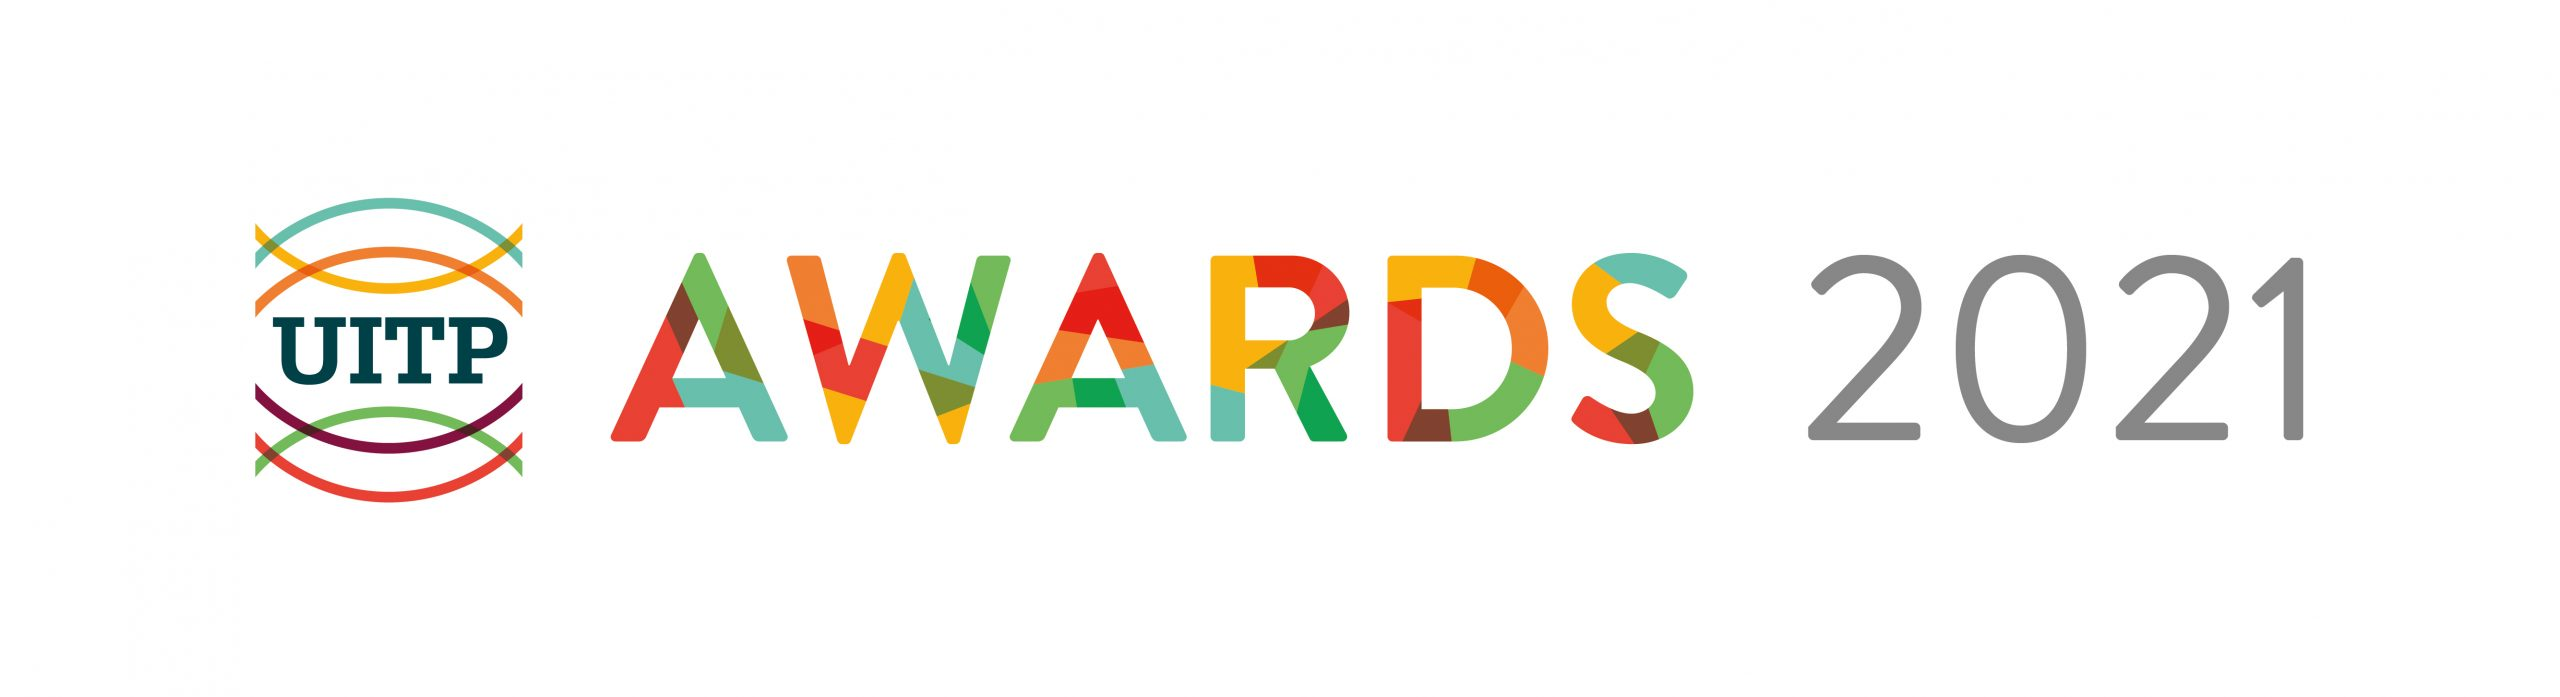 Logo of the UITP awards 2021